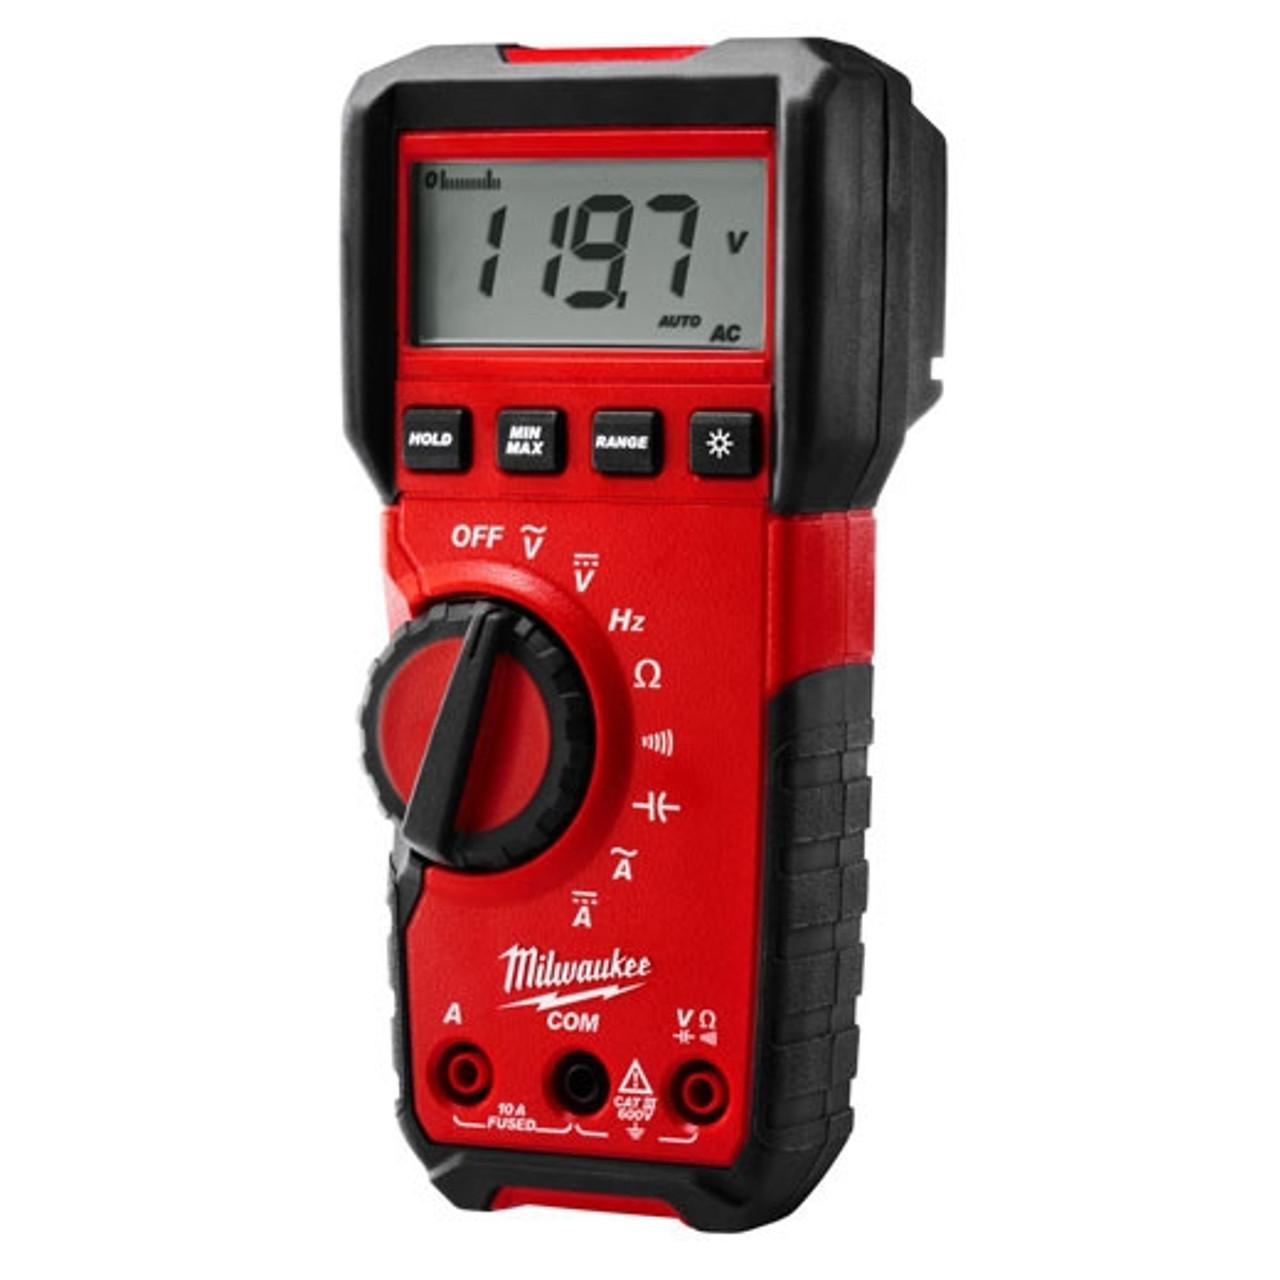 Milwaukee 2216-20 Digital Multimeter 600 ohm to 40 Mohm